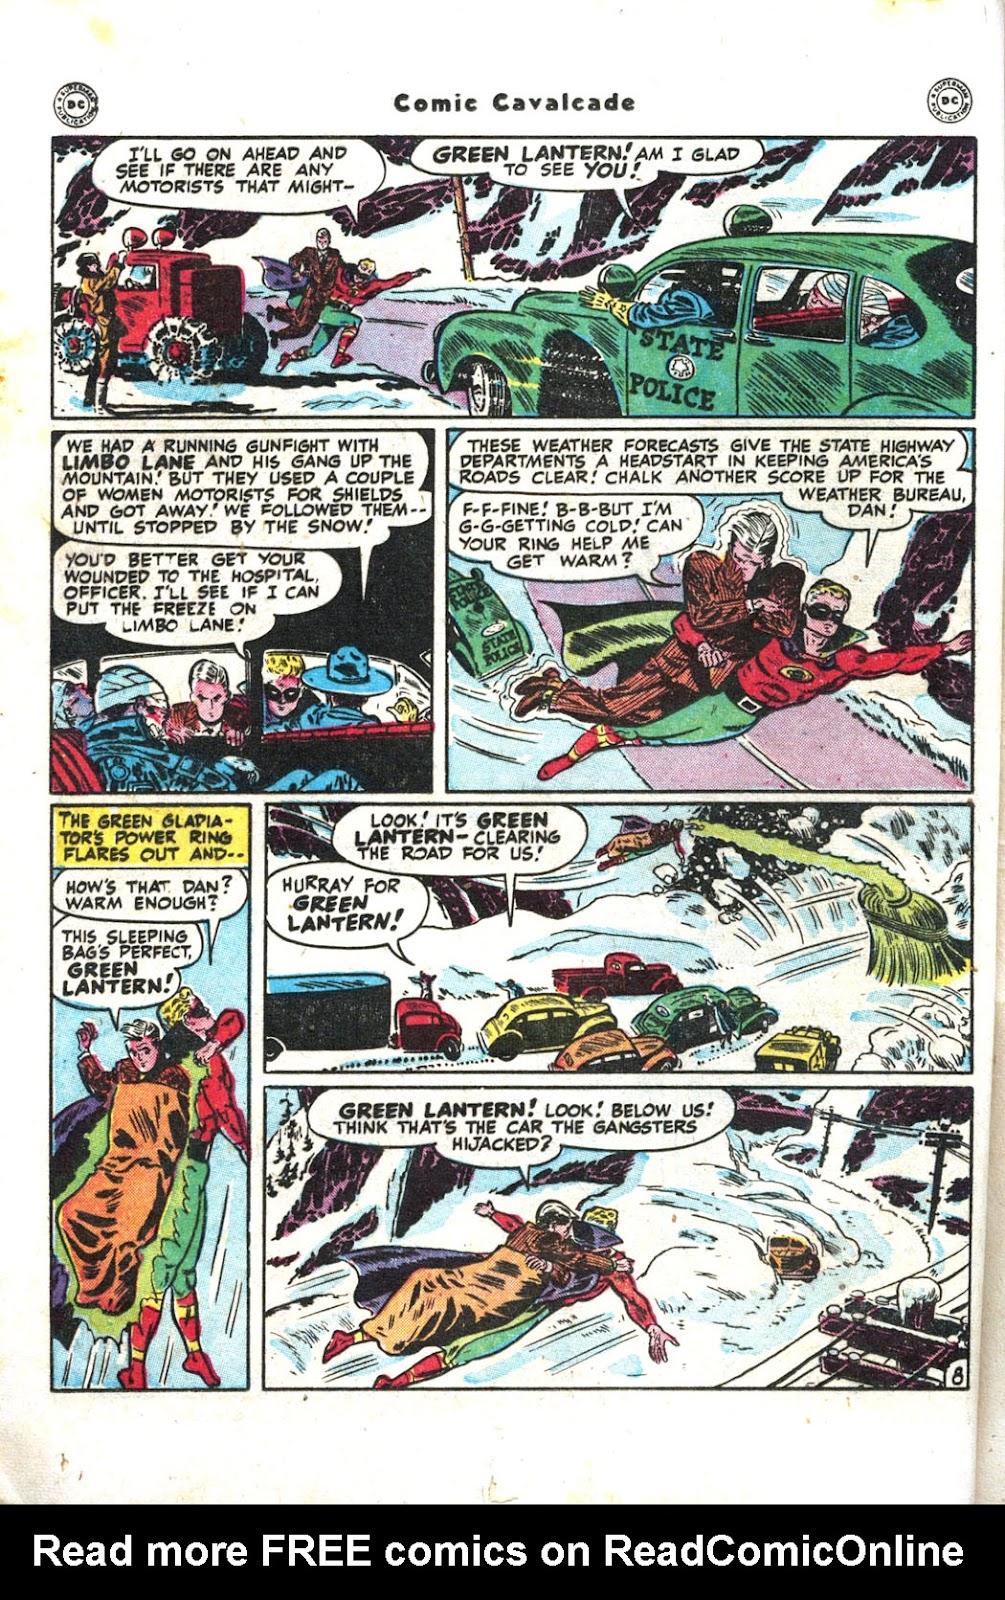 Comic Cavalcade issue 26 - Page 34